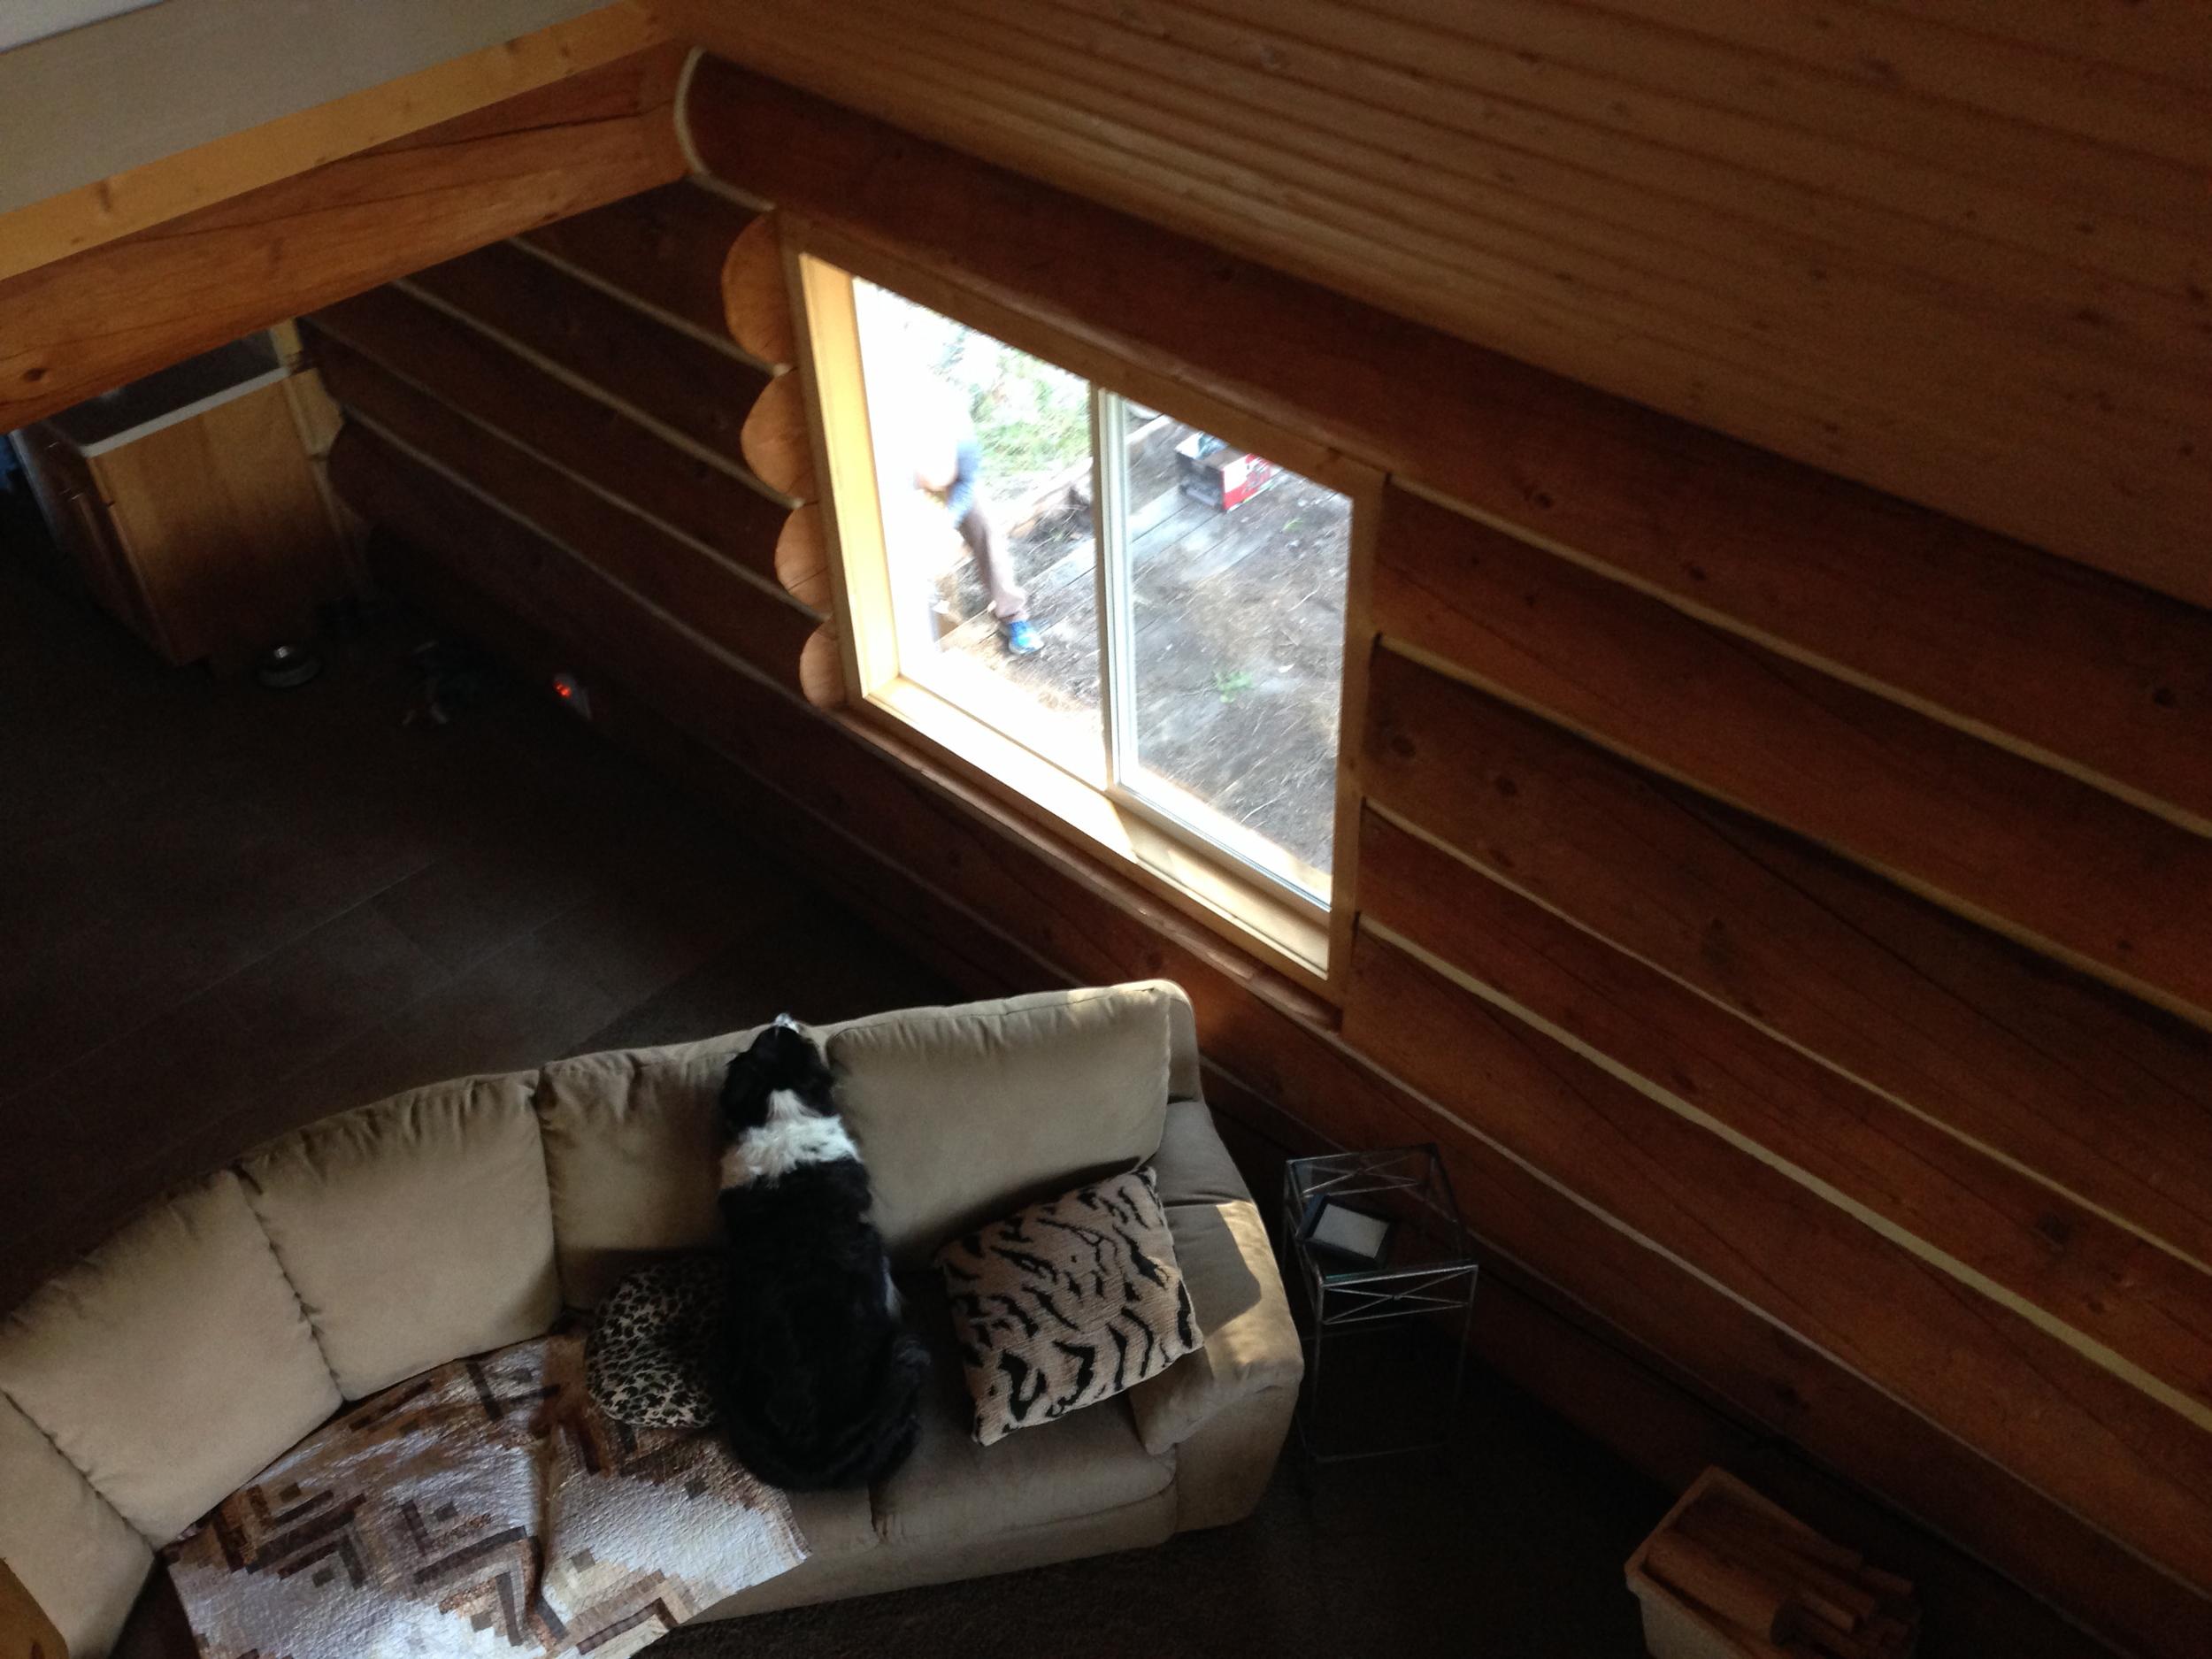 Fiona watching her Daddy work through the window.